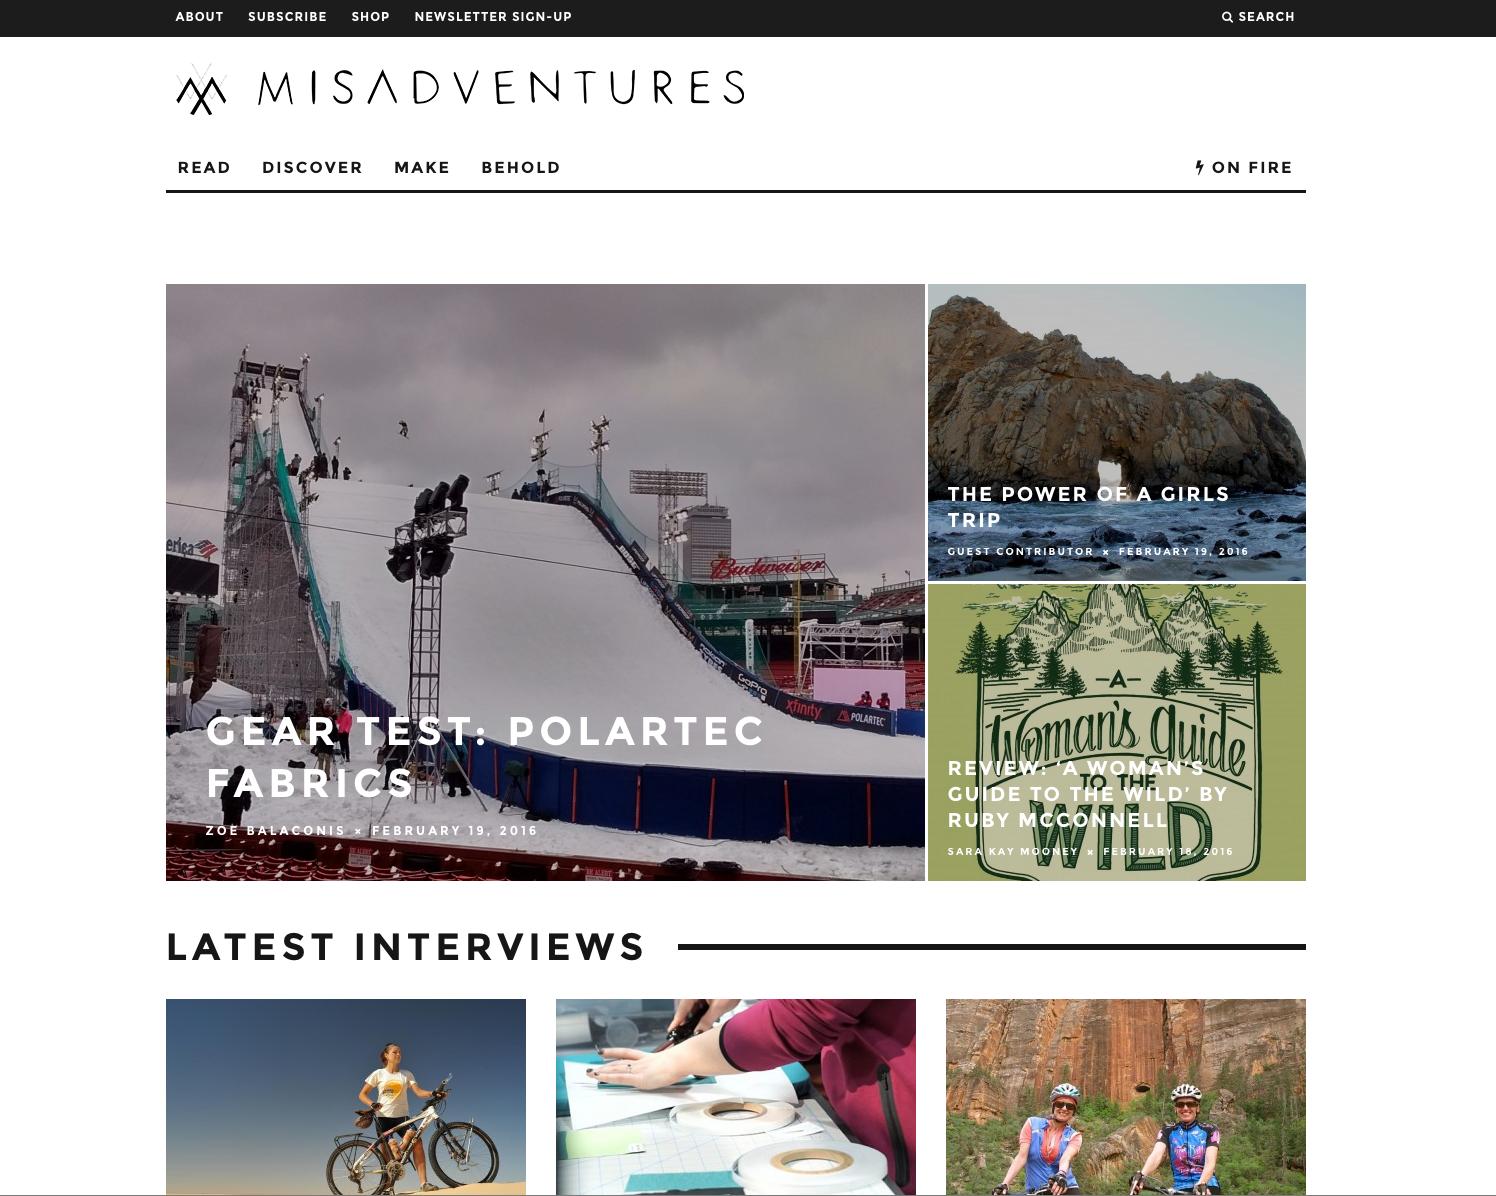 Misadventures Magazine